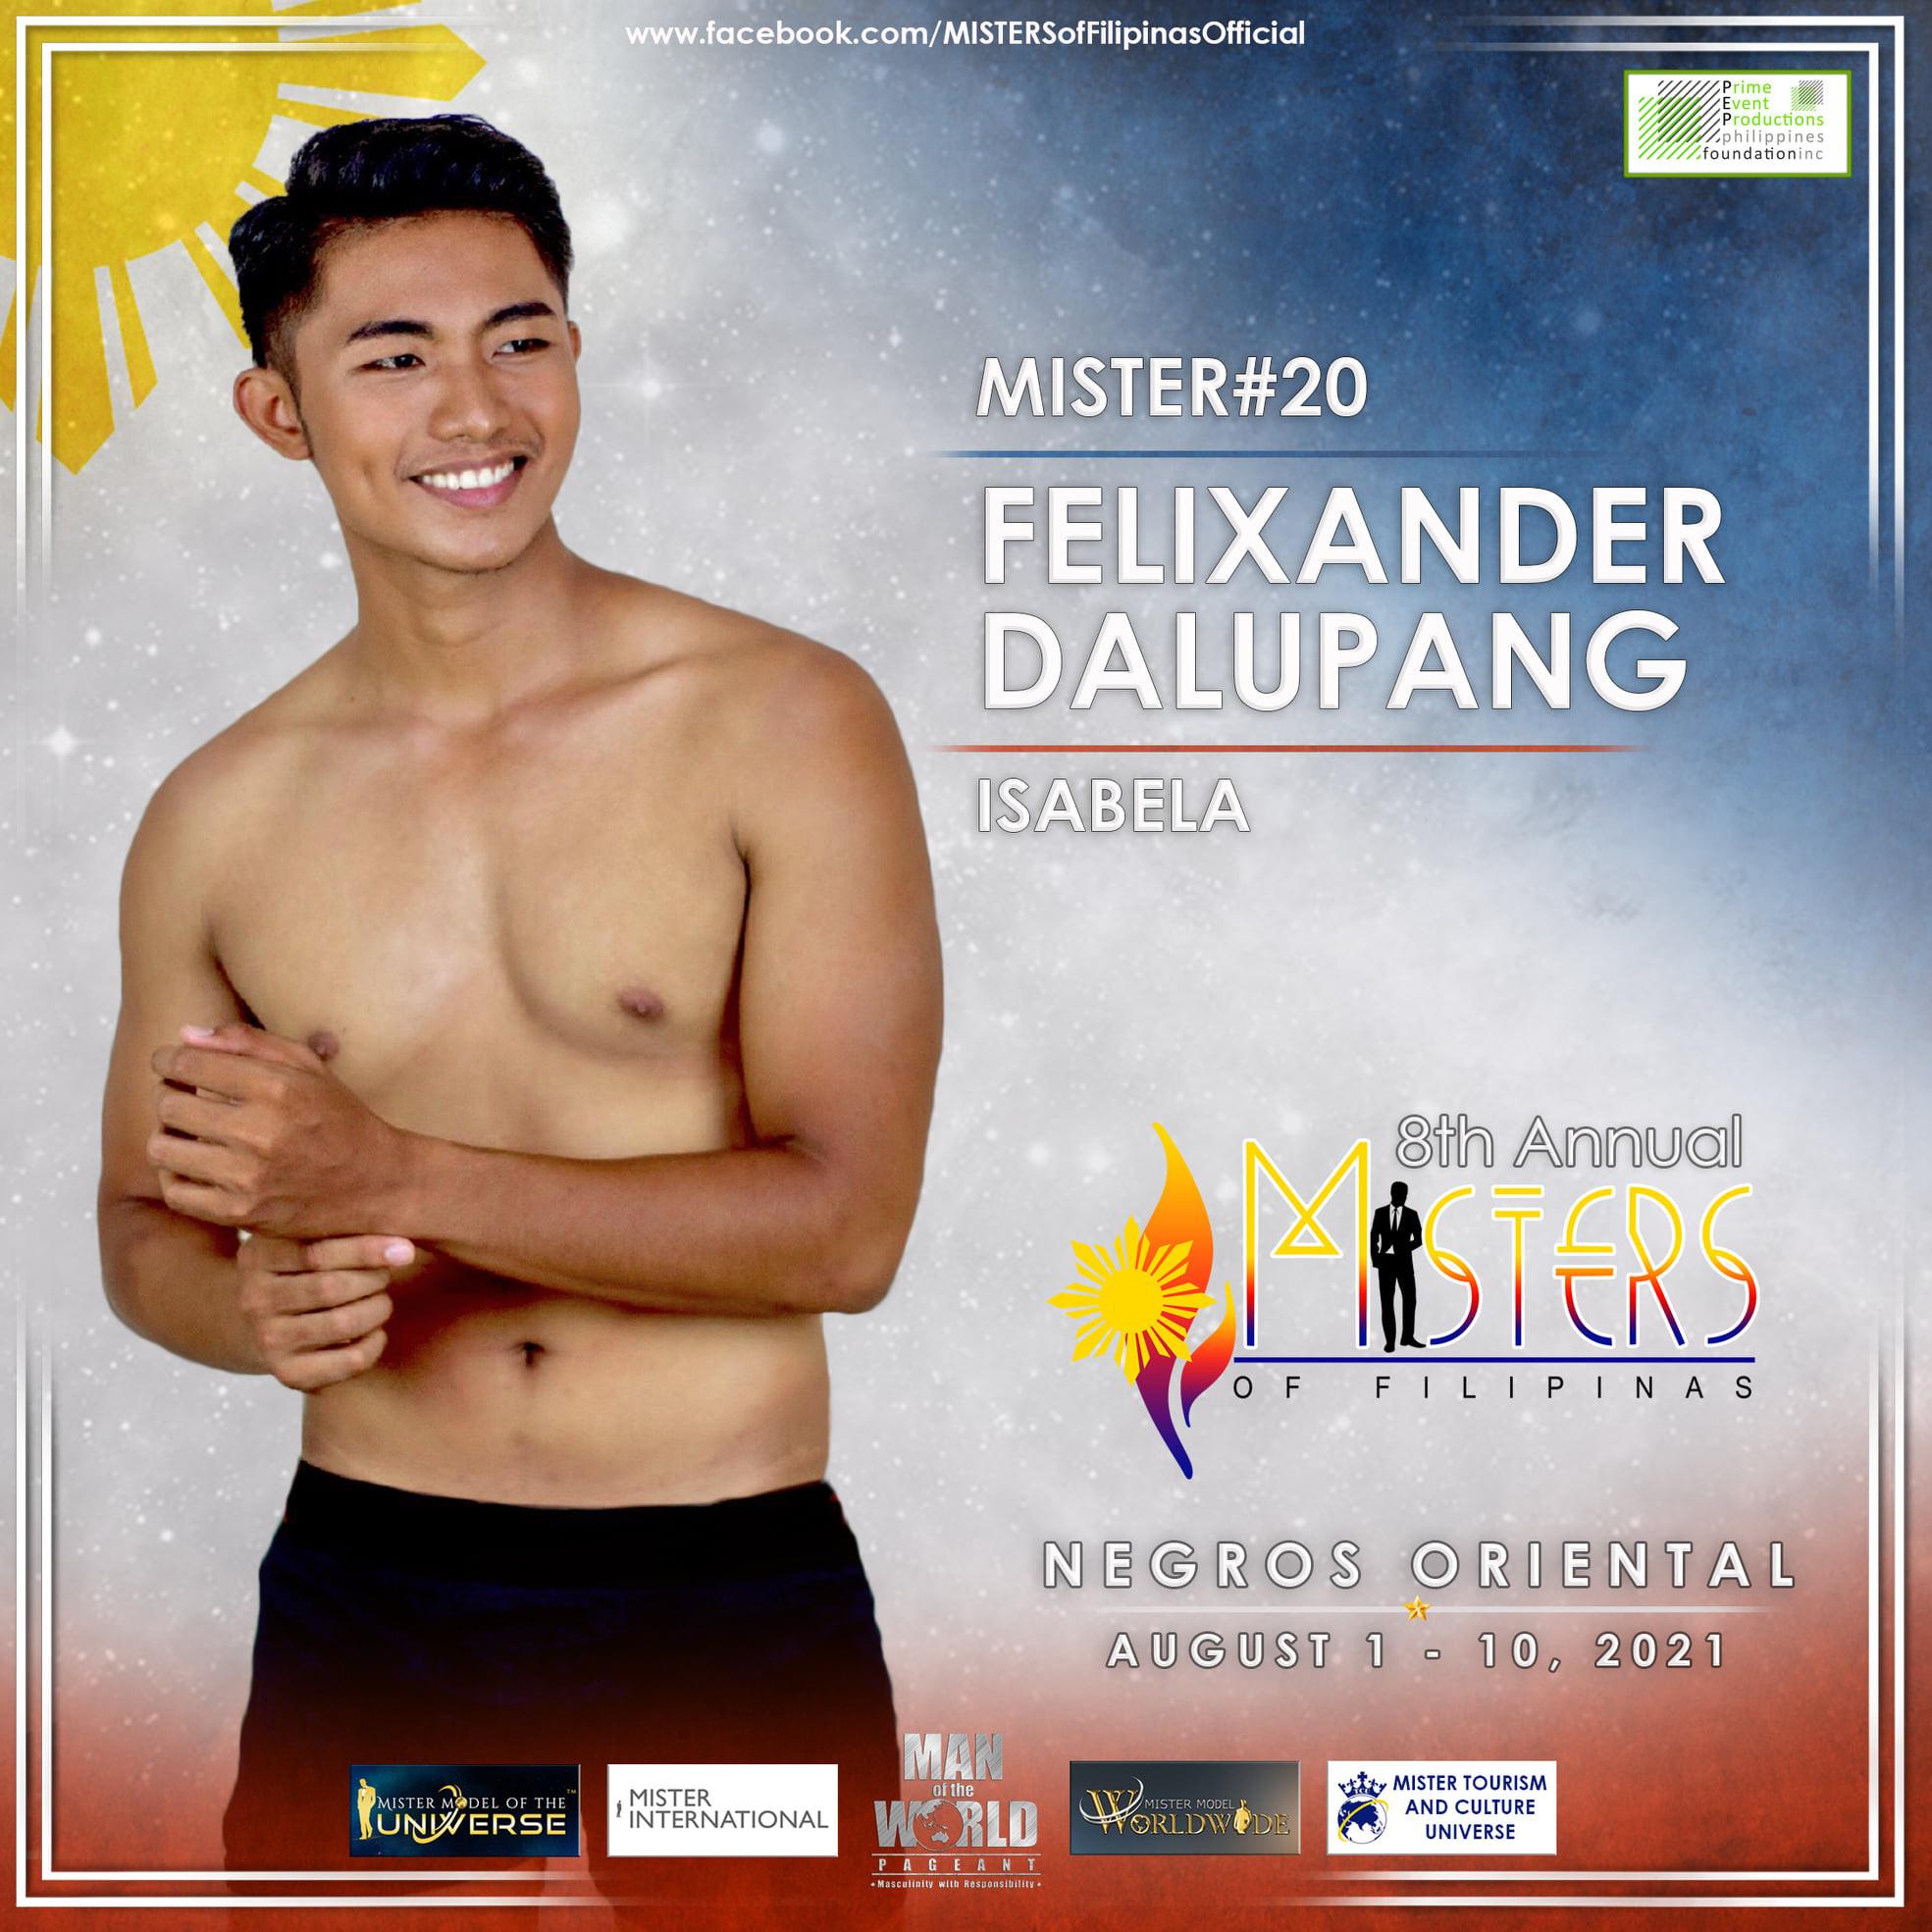 candidatos a misters of filipinas 2021. final: 27 agosto. - Página 2 Owo8dB